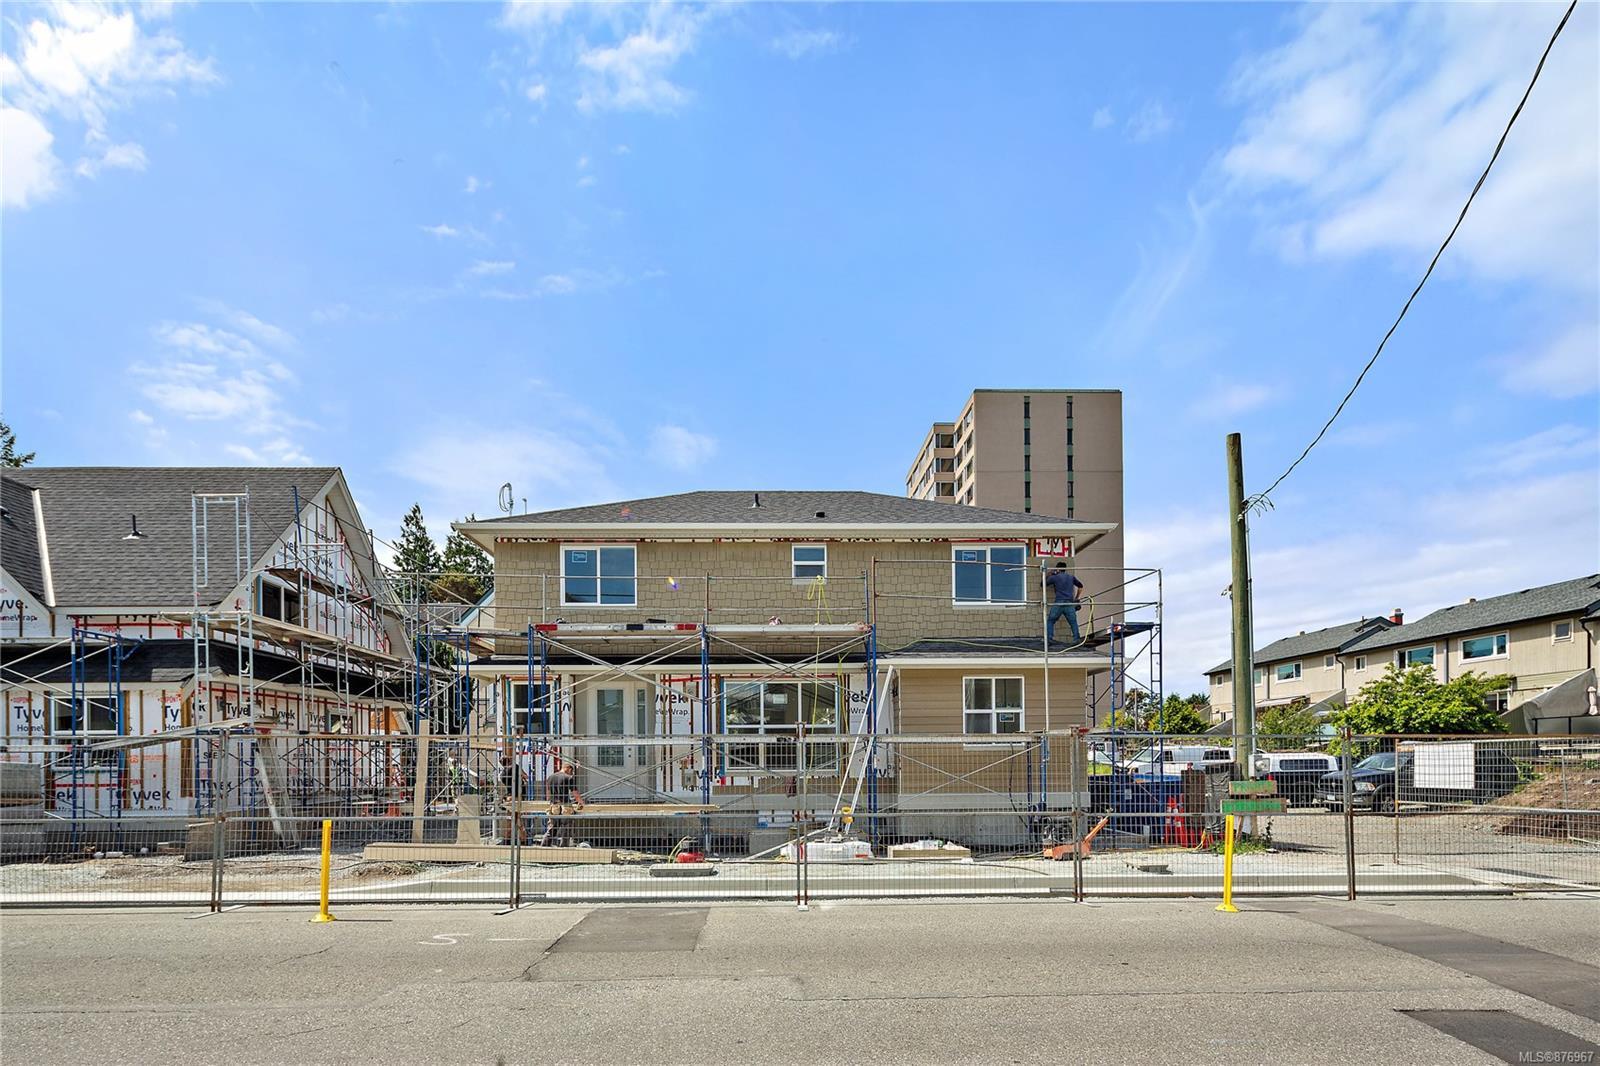 565 Simcoe Street, James Bay, Victoria